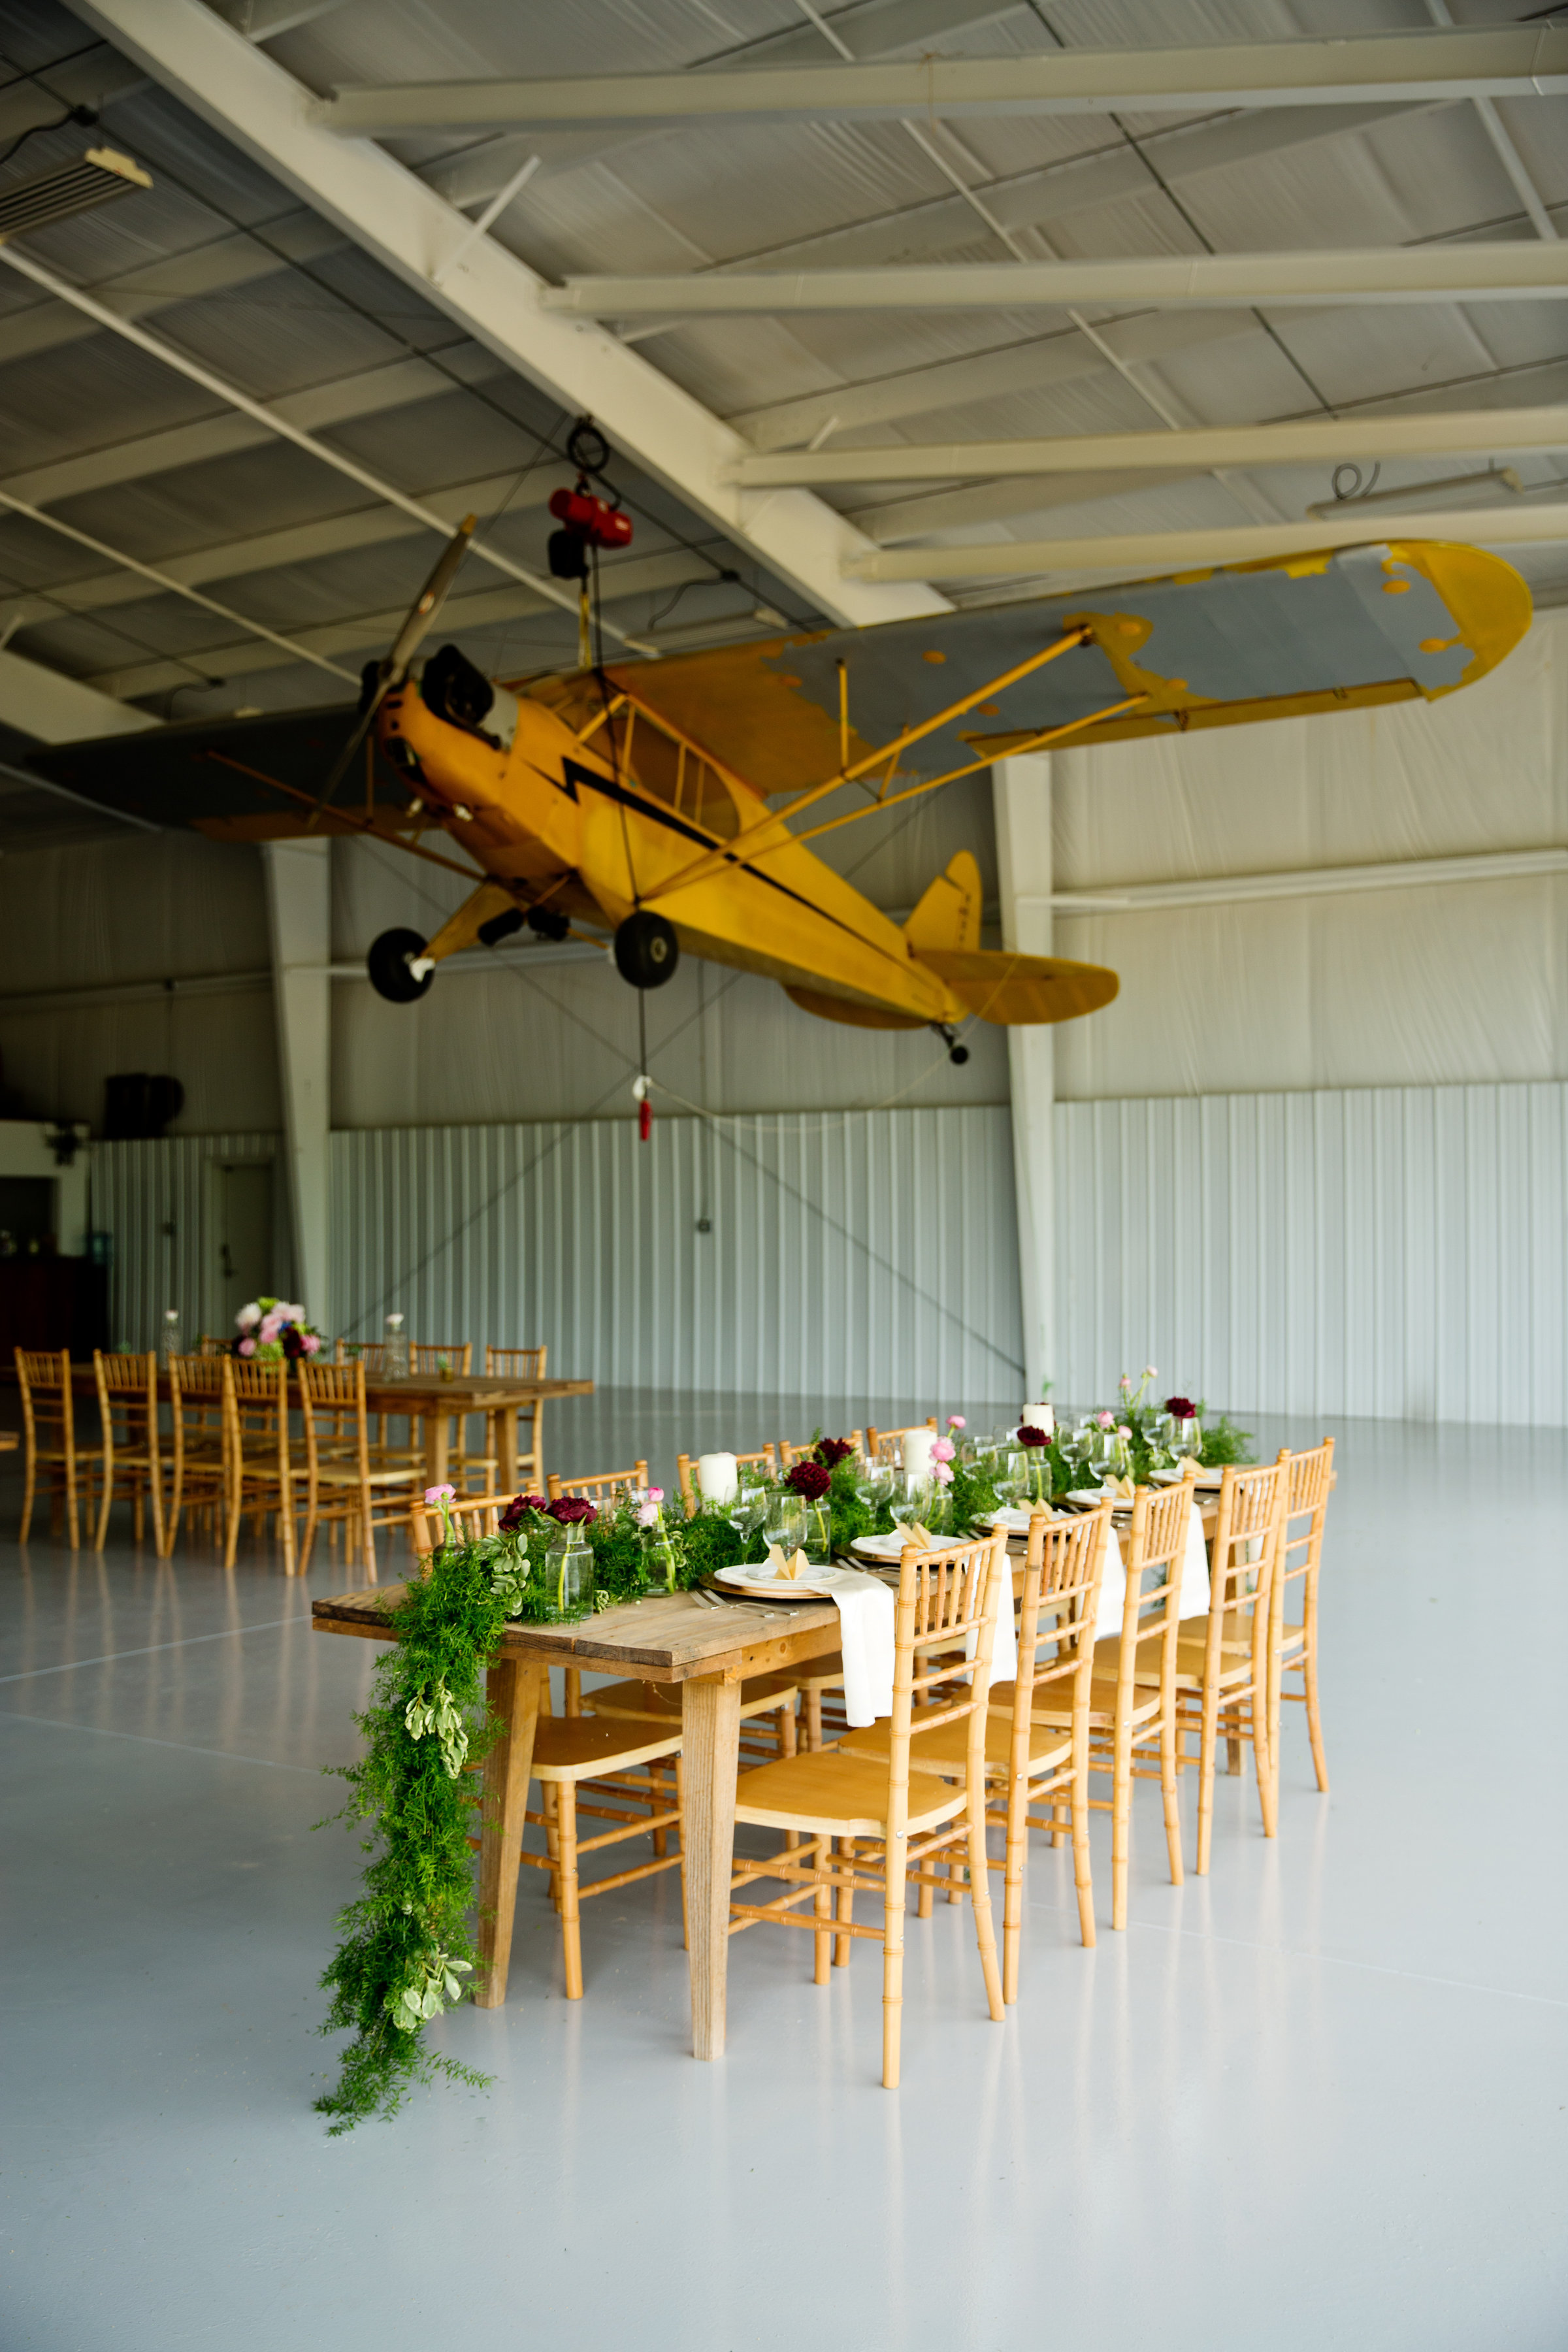 hangar113